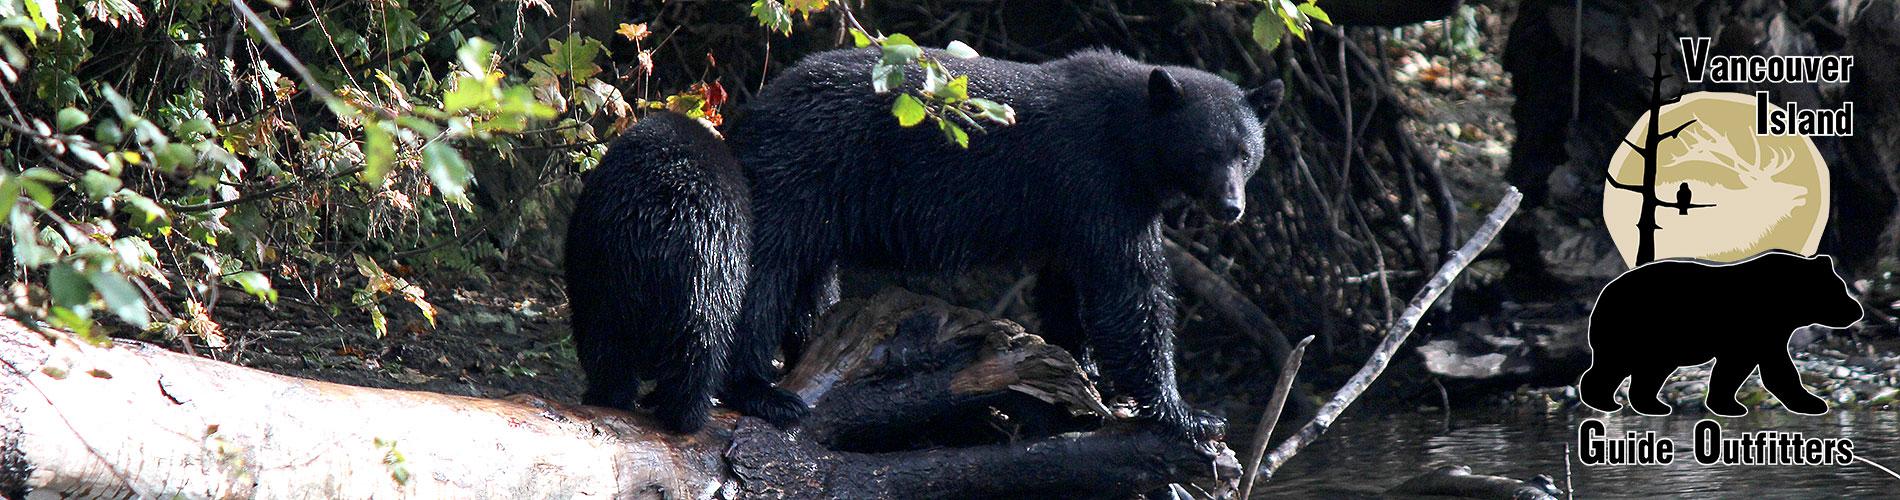 Coastal Black Bear Hunts on Vancouver Island